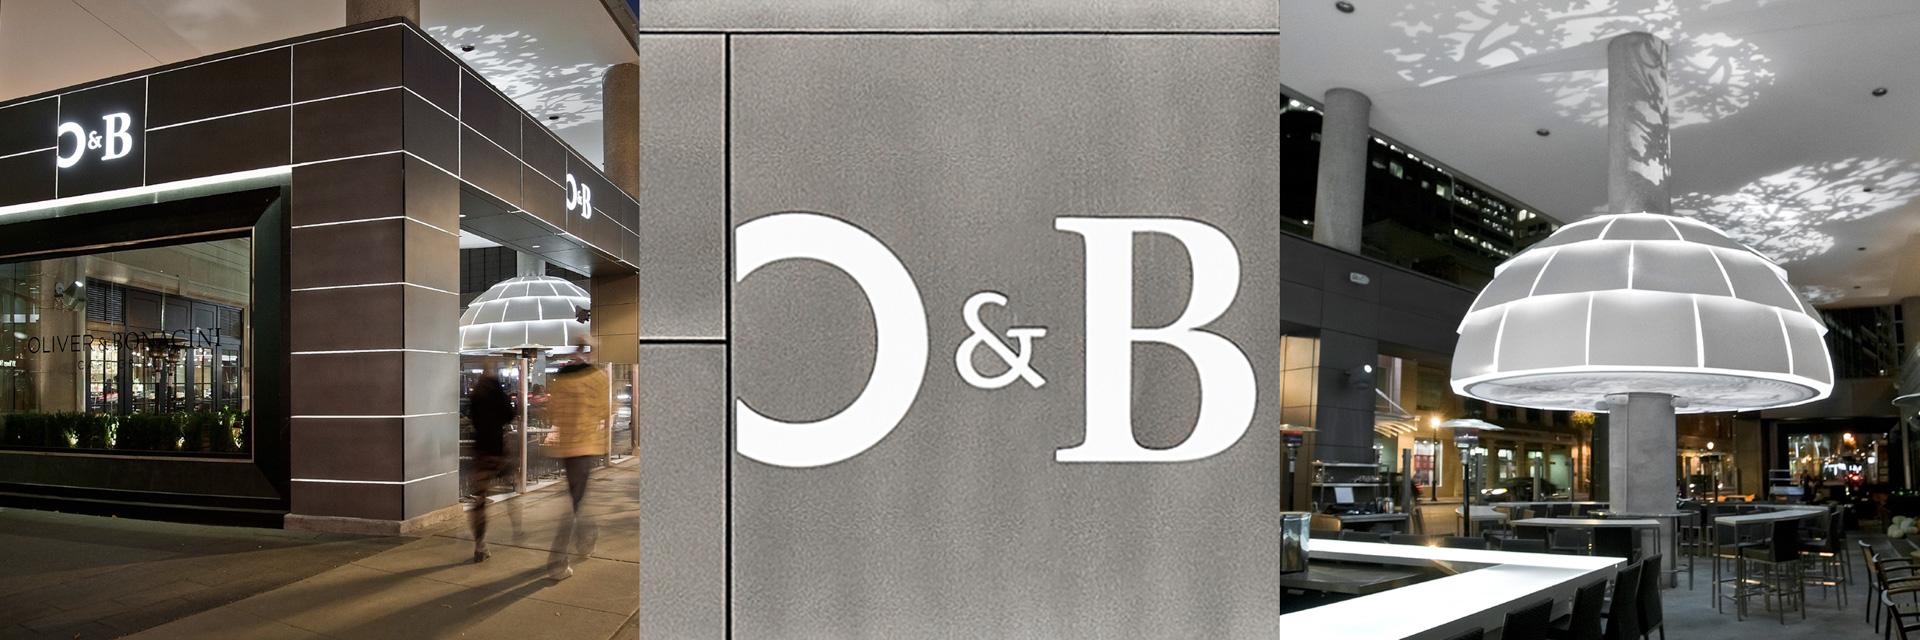 portfolio Oliver & Bonacini